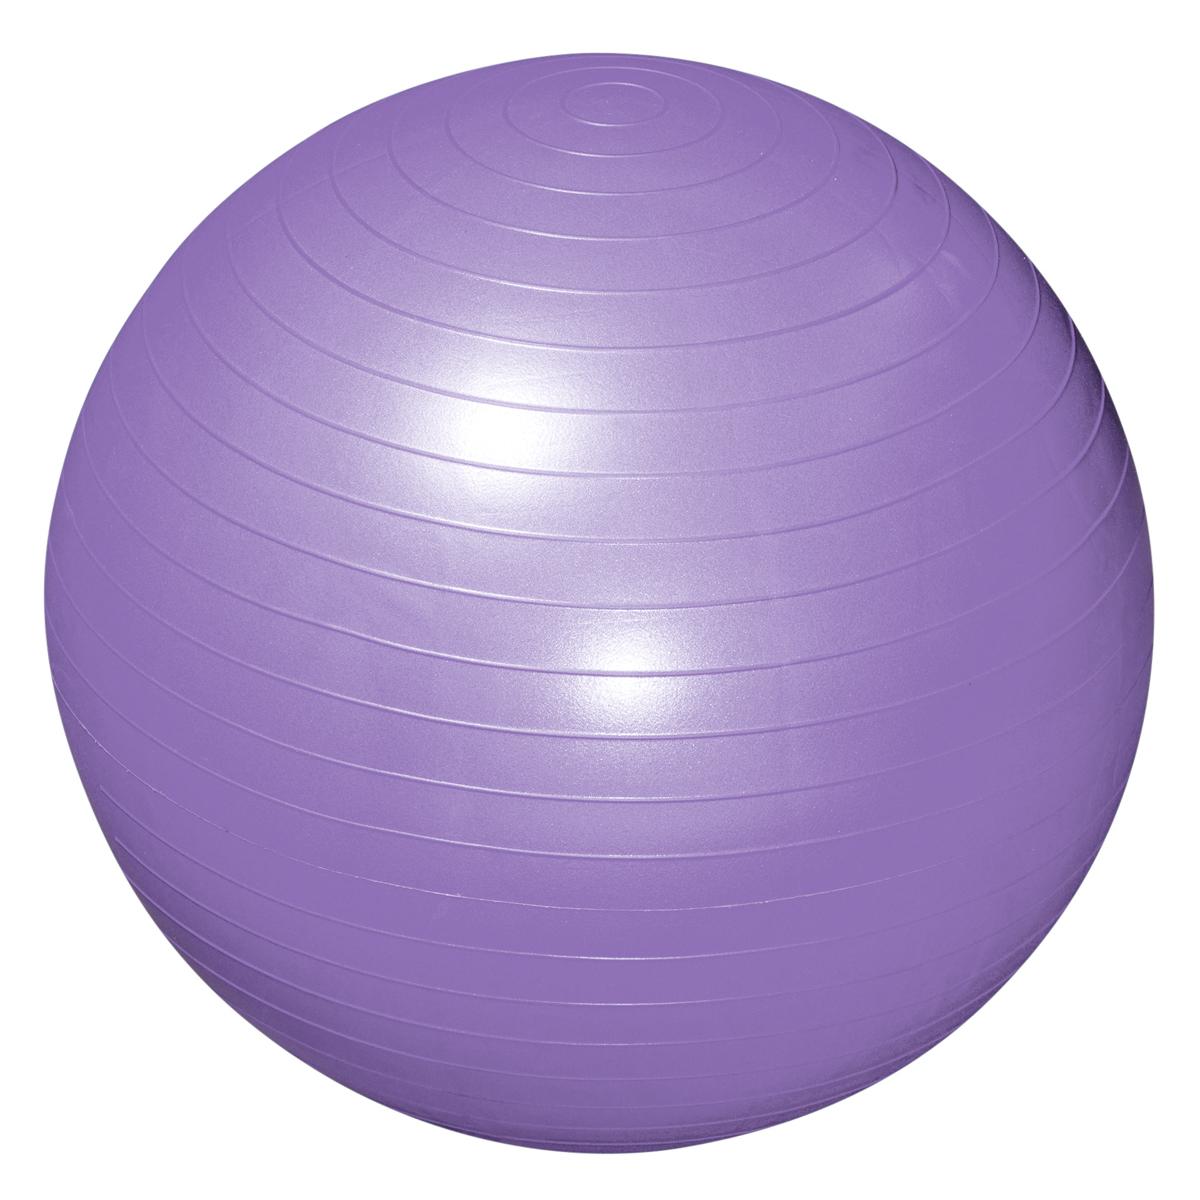 Celsius Anti-Burst 55cm Fitness Gym Ball